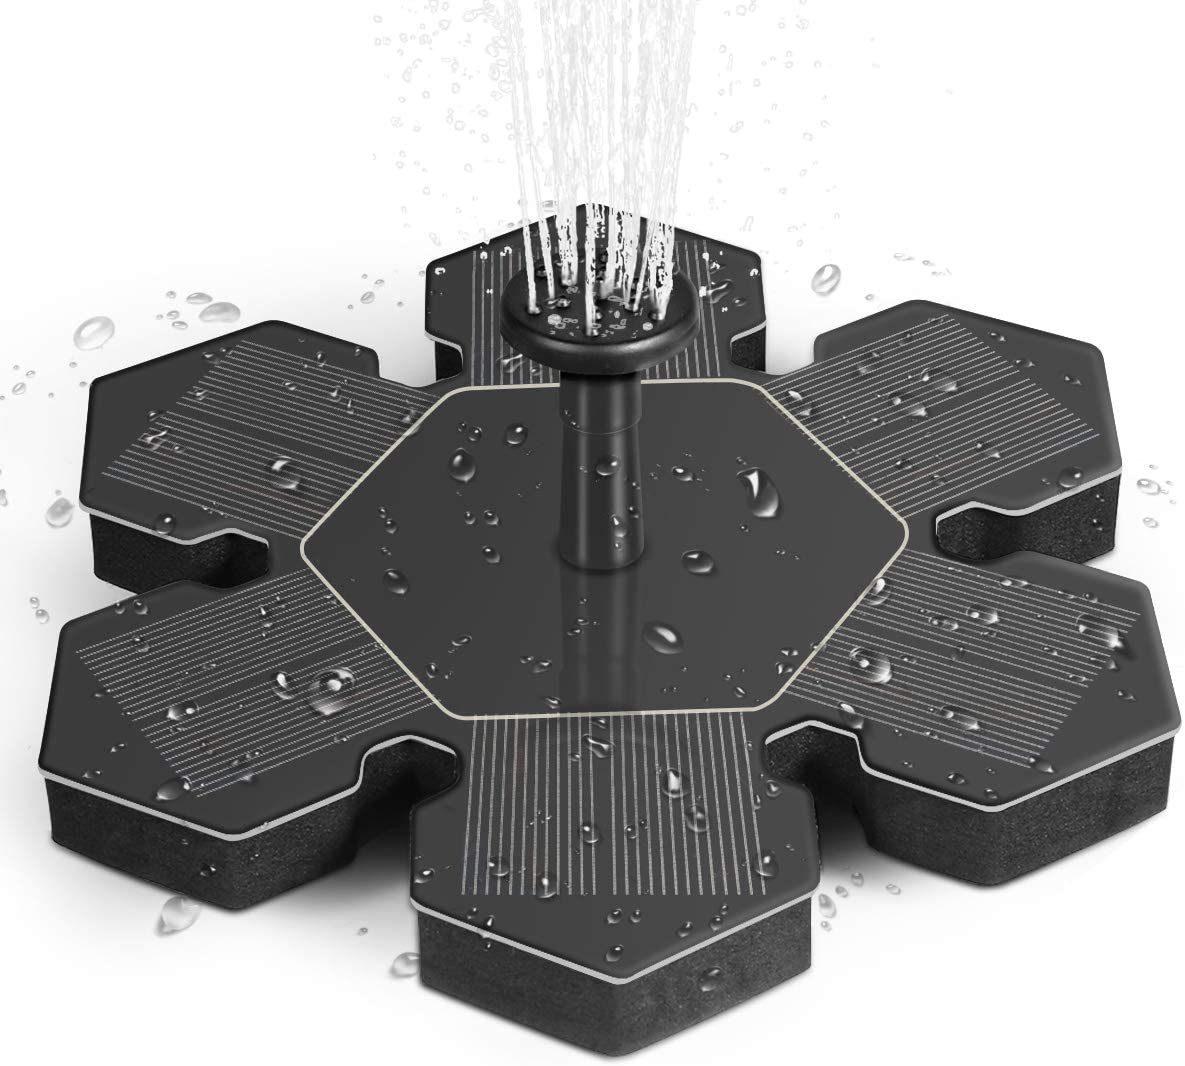 Solar fountain kit